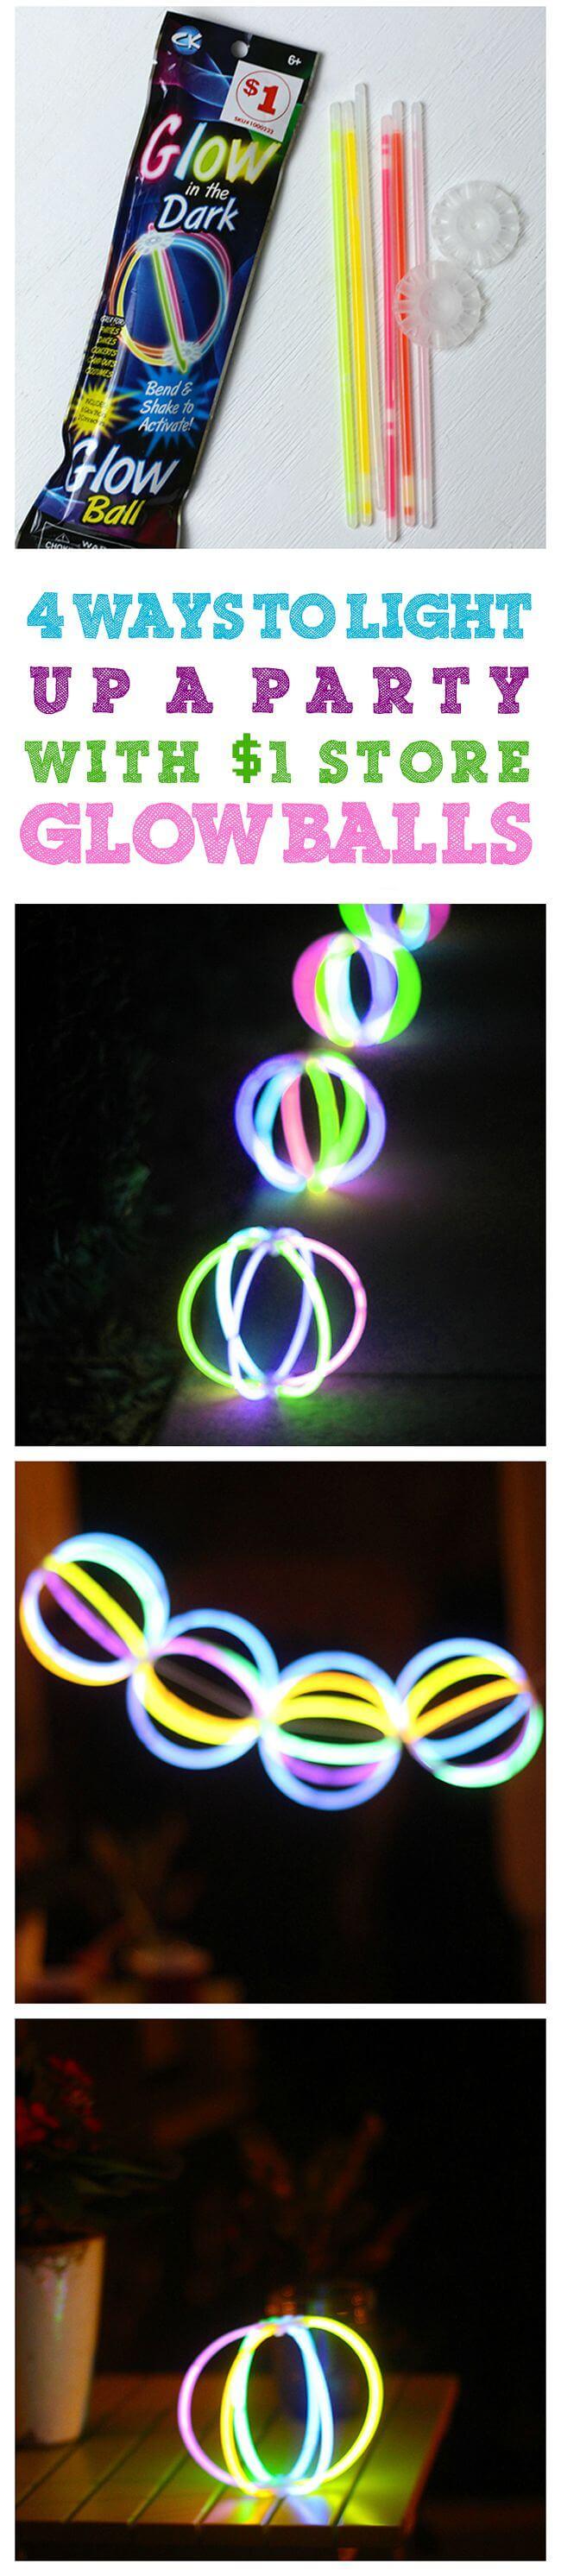 String Together Some Glow Balls Using Glow Sticks